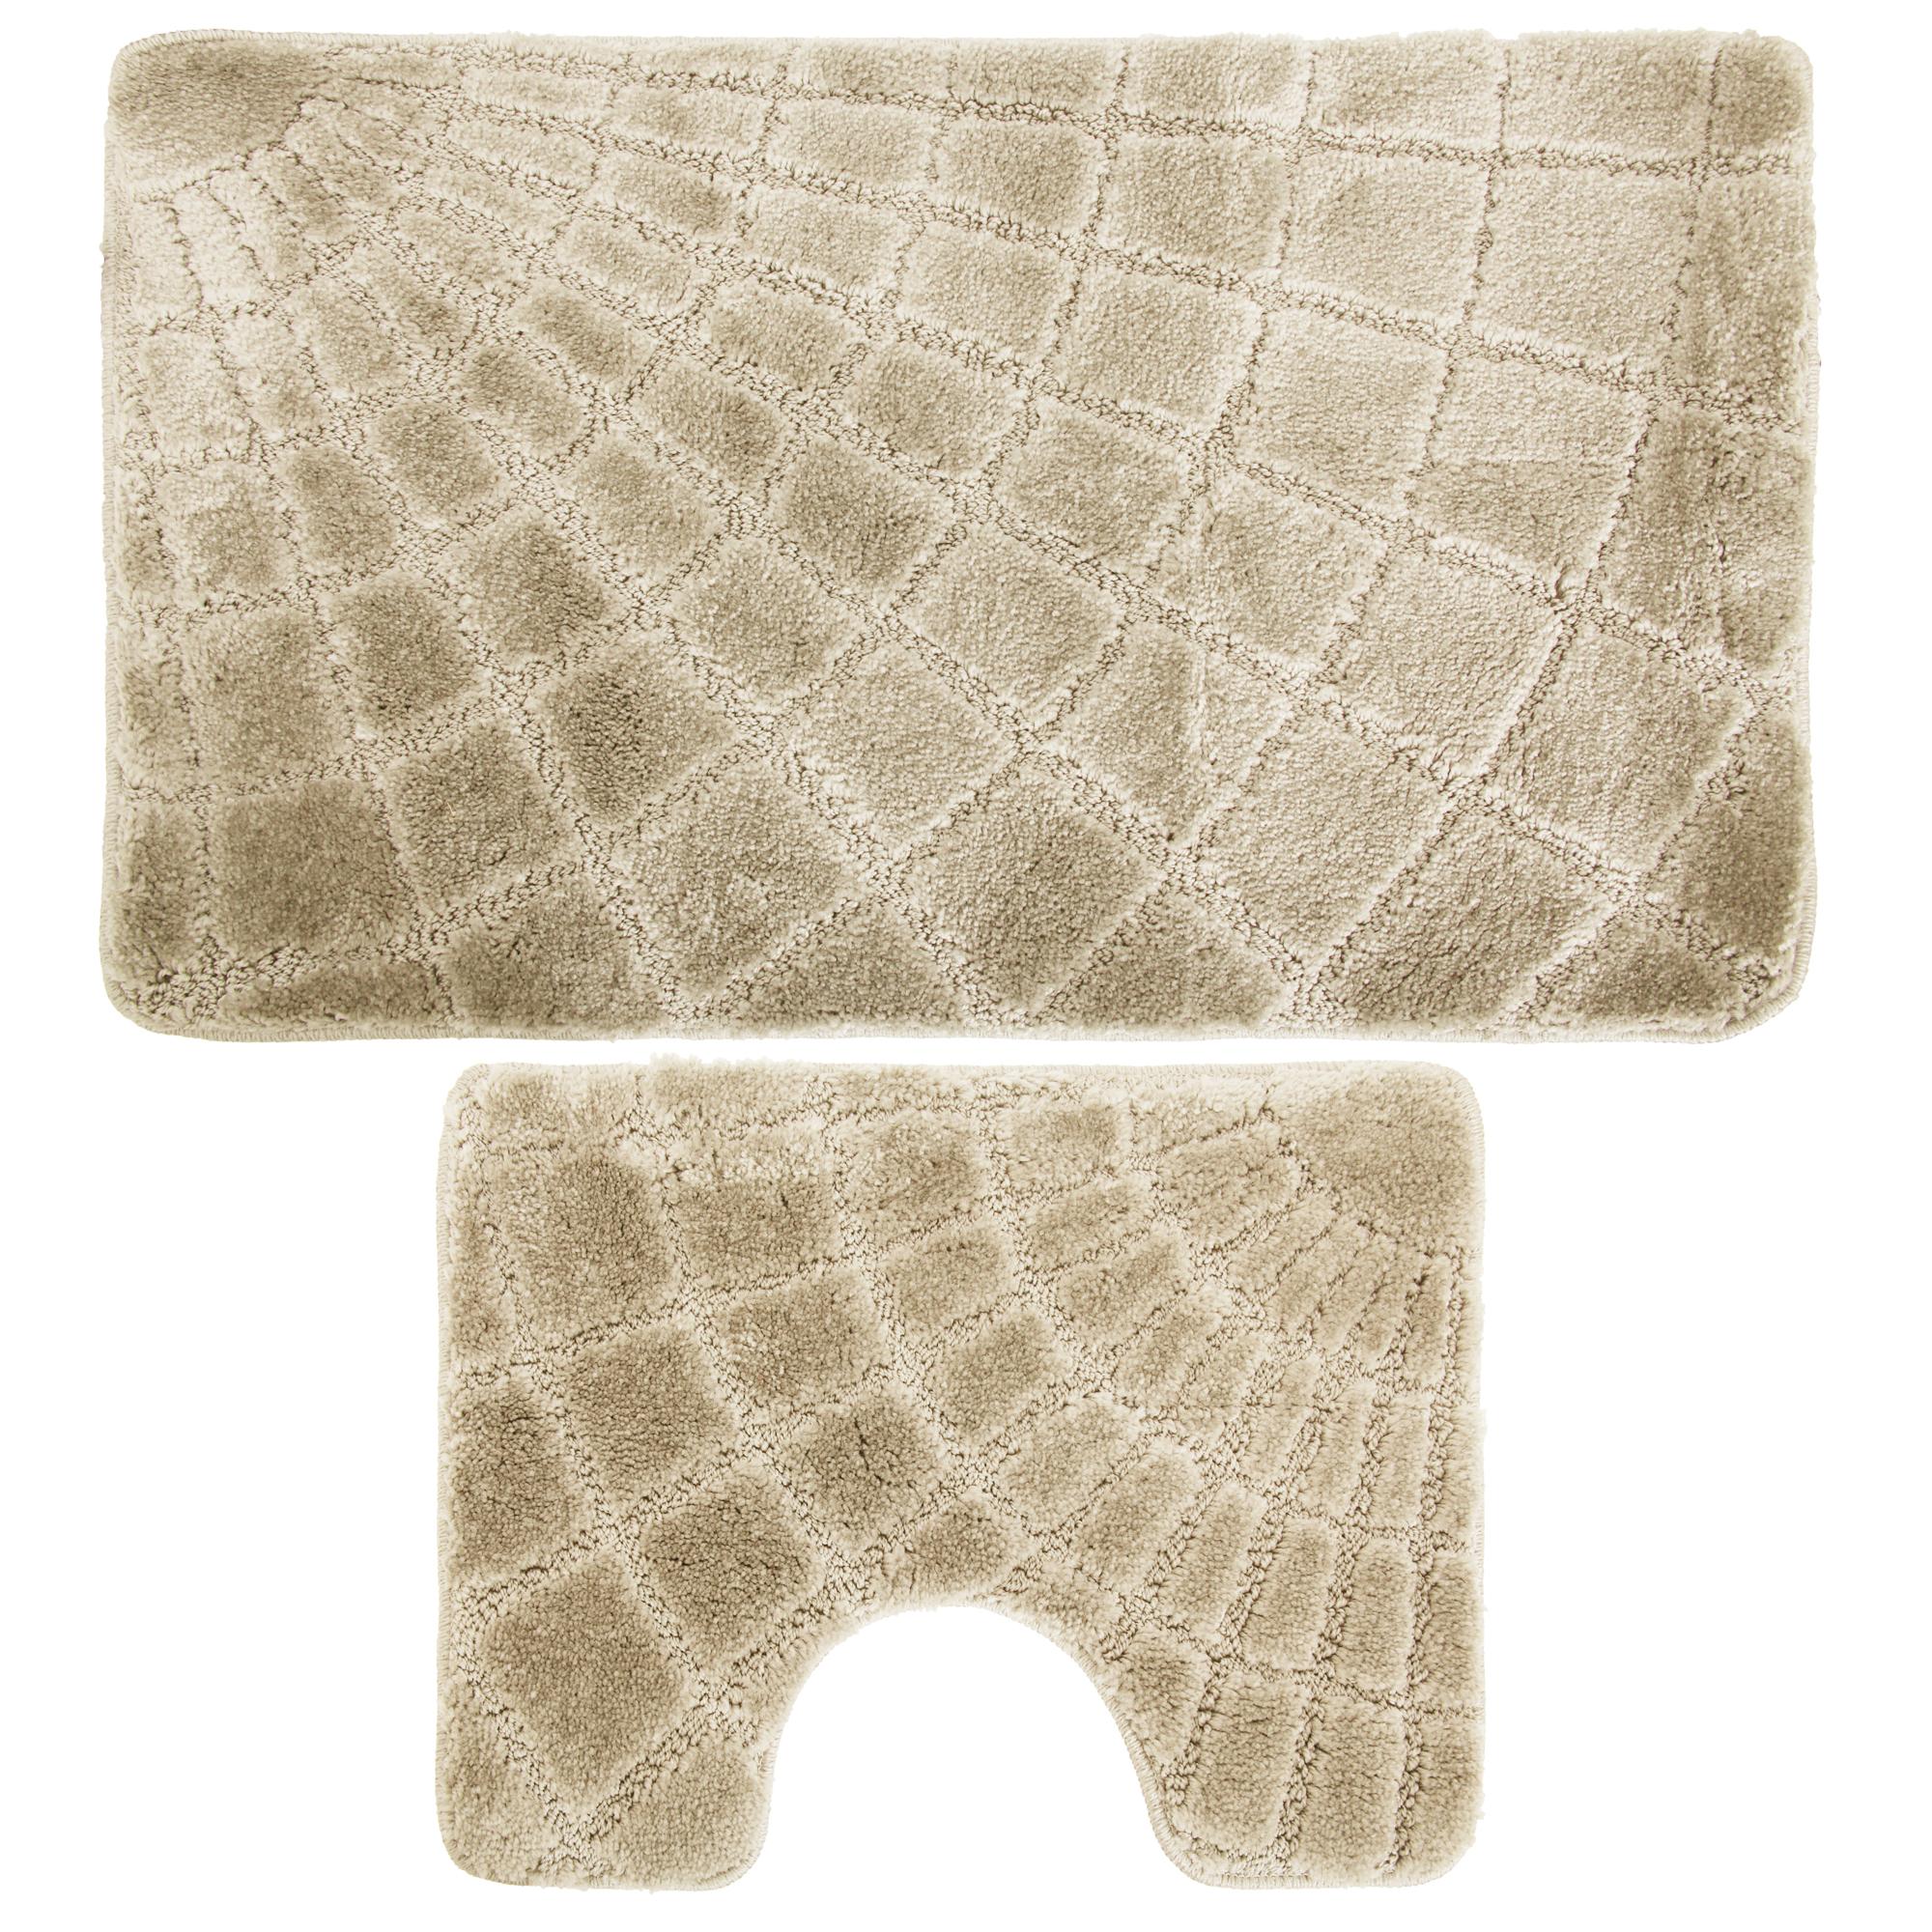 2 Piece Supreme Web Design Bath Pedestal Bathroom Mat Set Ebay